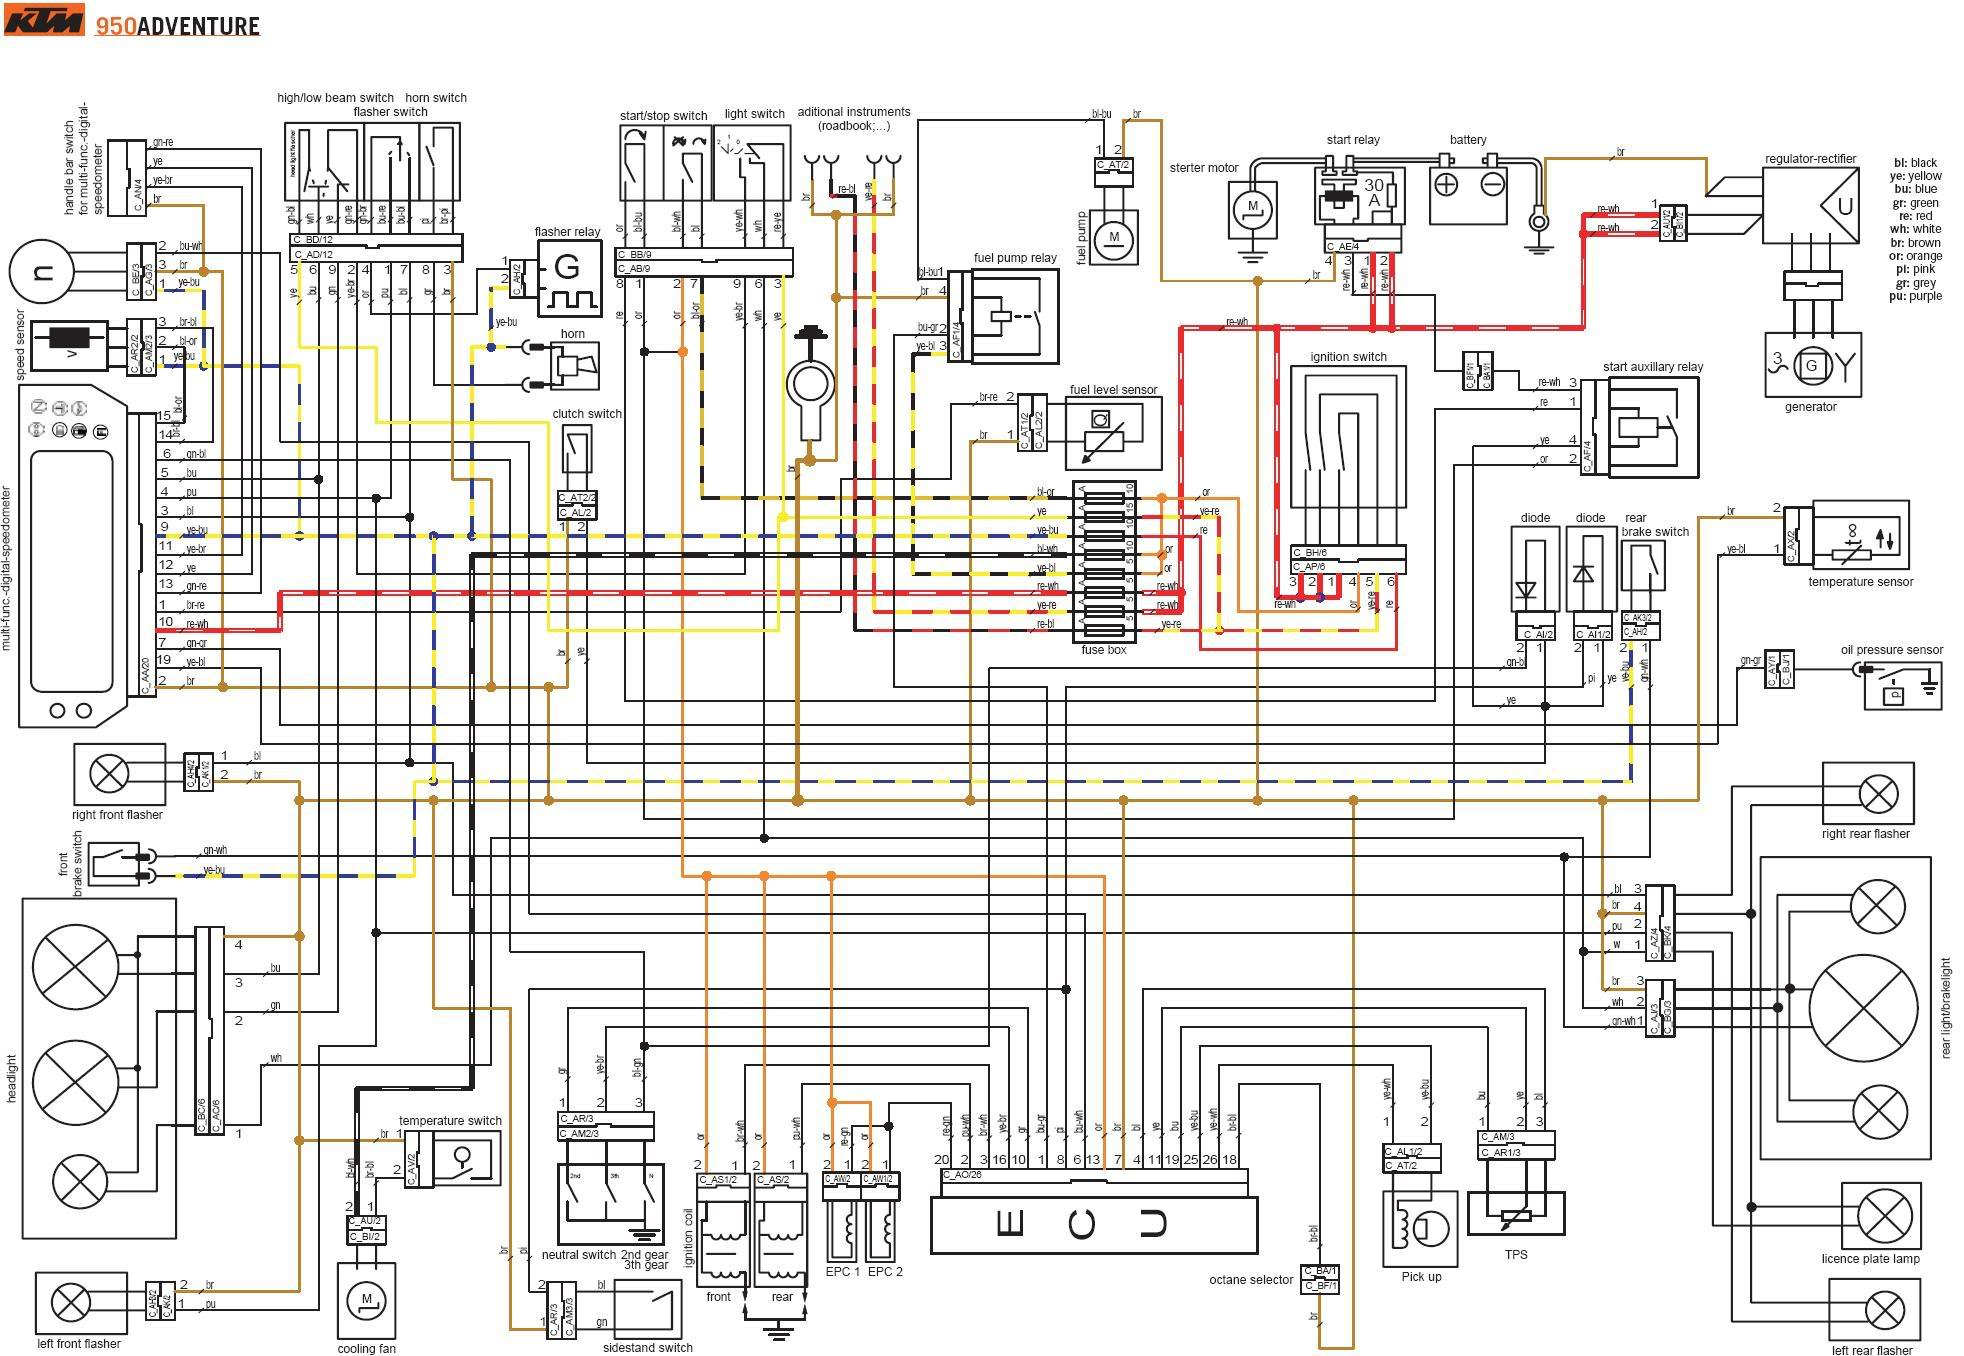 ktm wiring harness ga 5890  ktm exc wiring diagram wiring harness wiring diagram ktm exc wiring harness ktm exc wiring diagram wiring harness